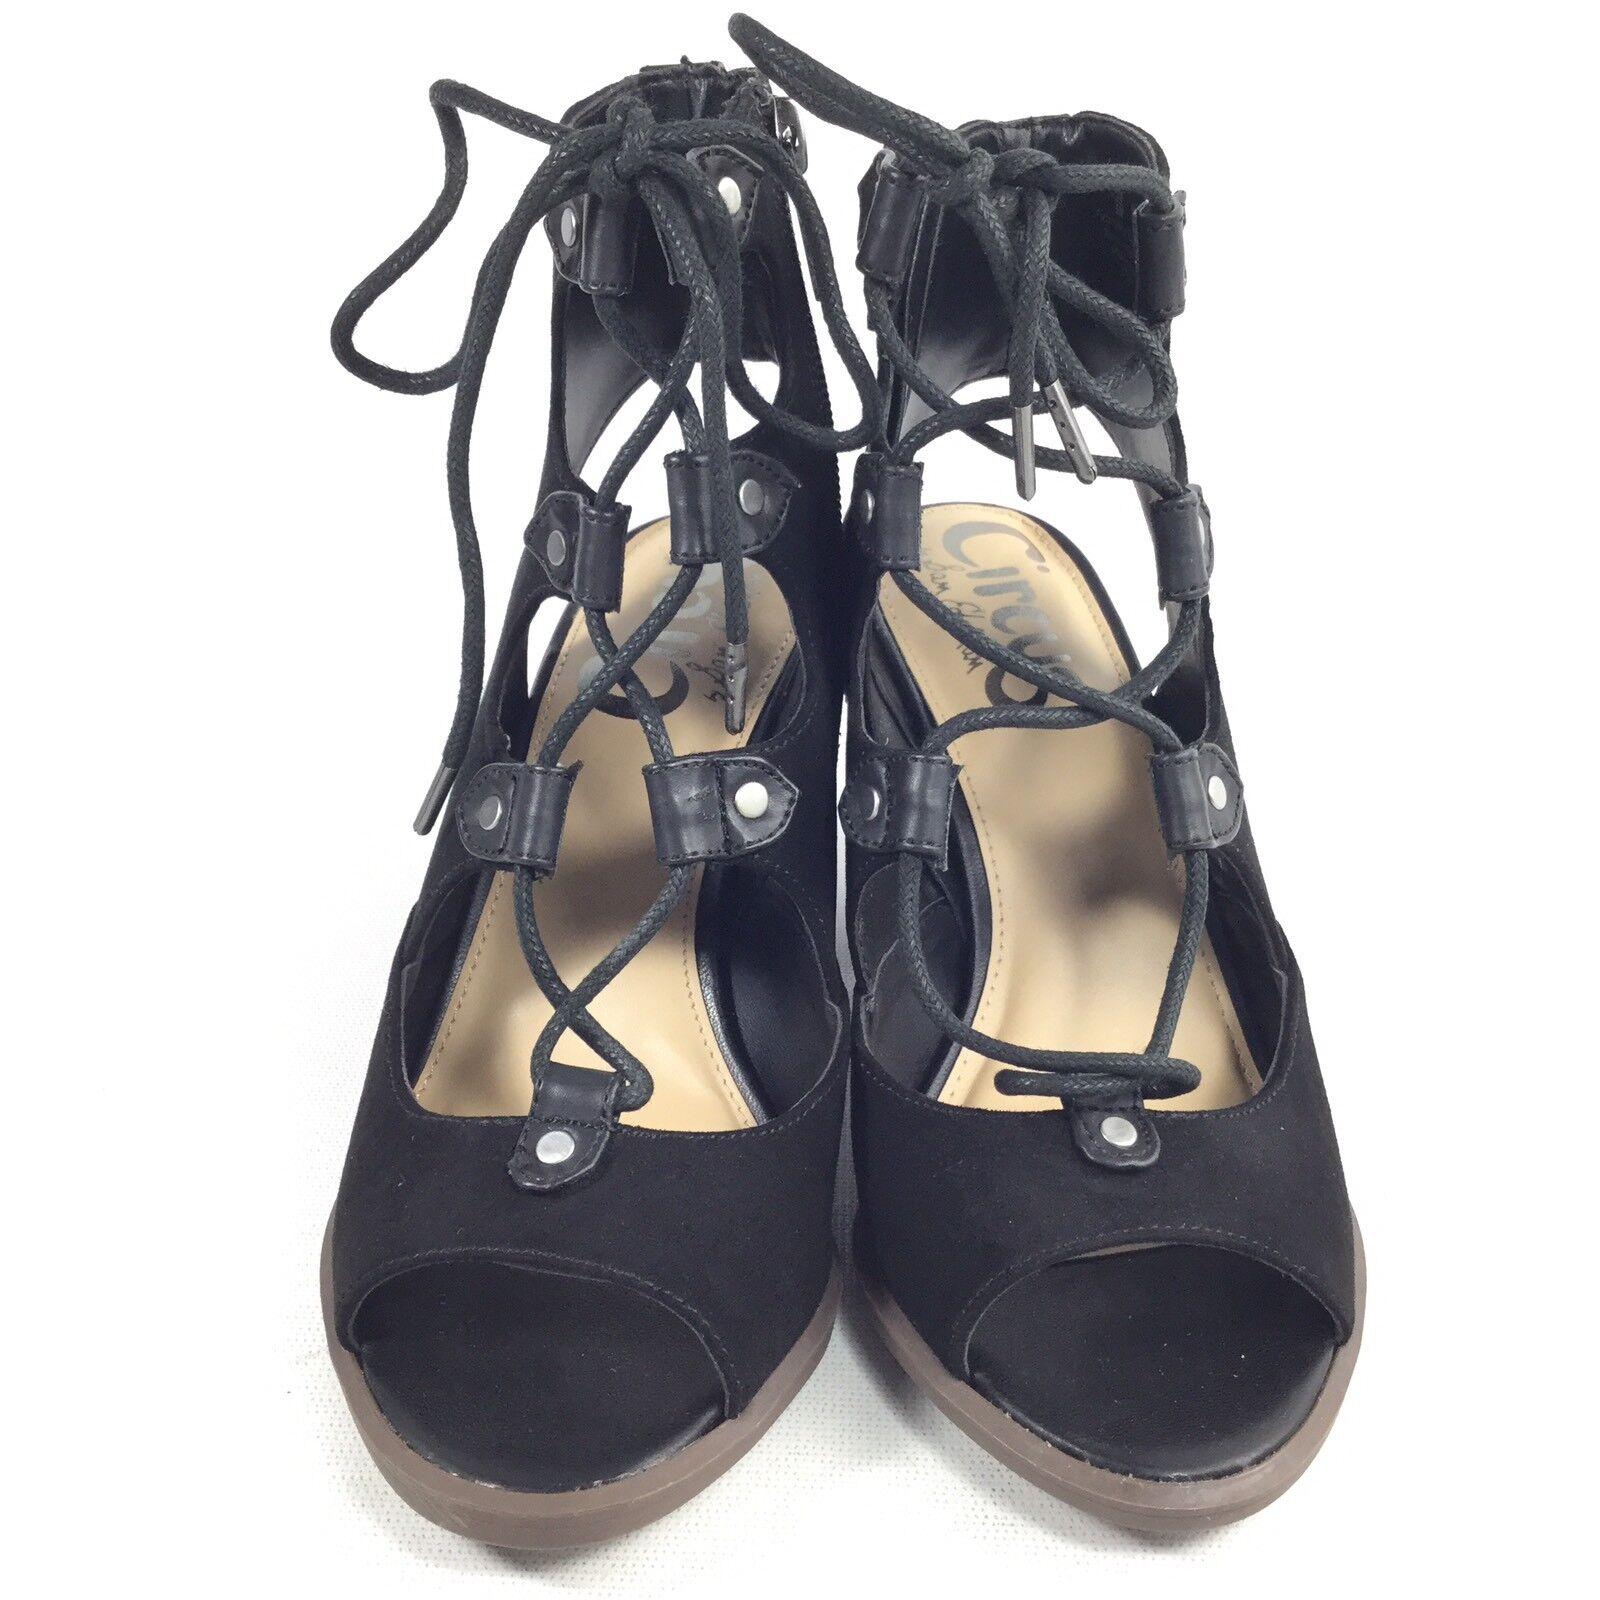 Circus By Sam Edelman Edelman Edelman Kiera Womens Size 5.5 M Black Heel Gladiator Sandals bc8a8f